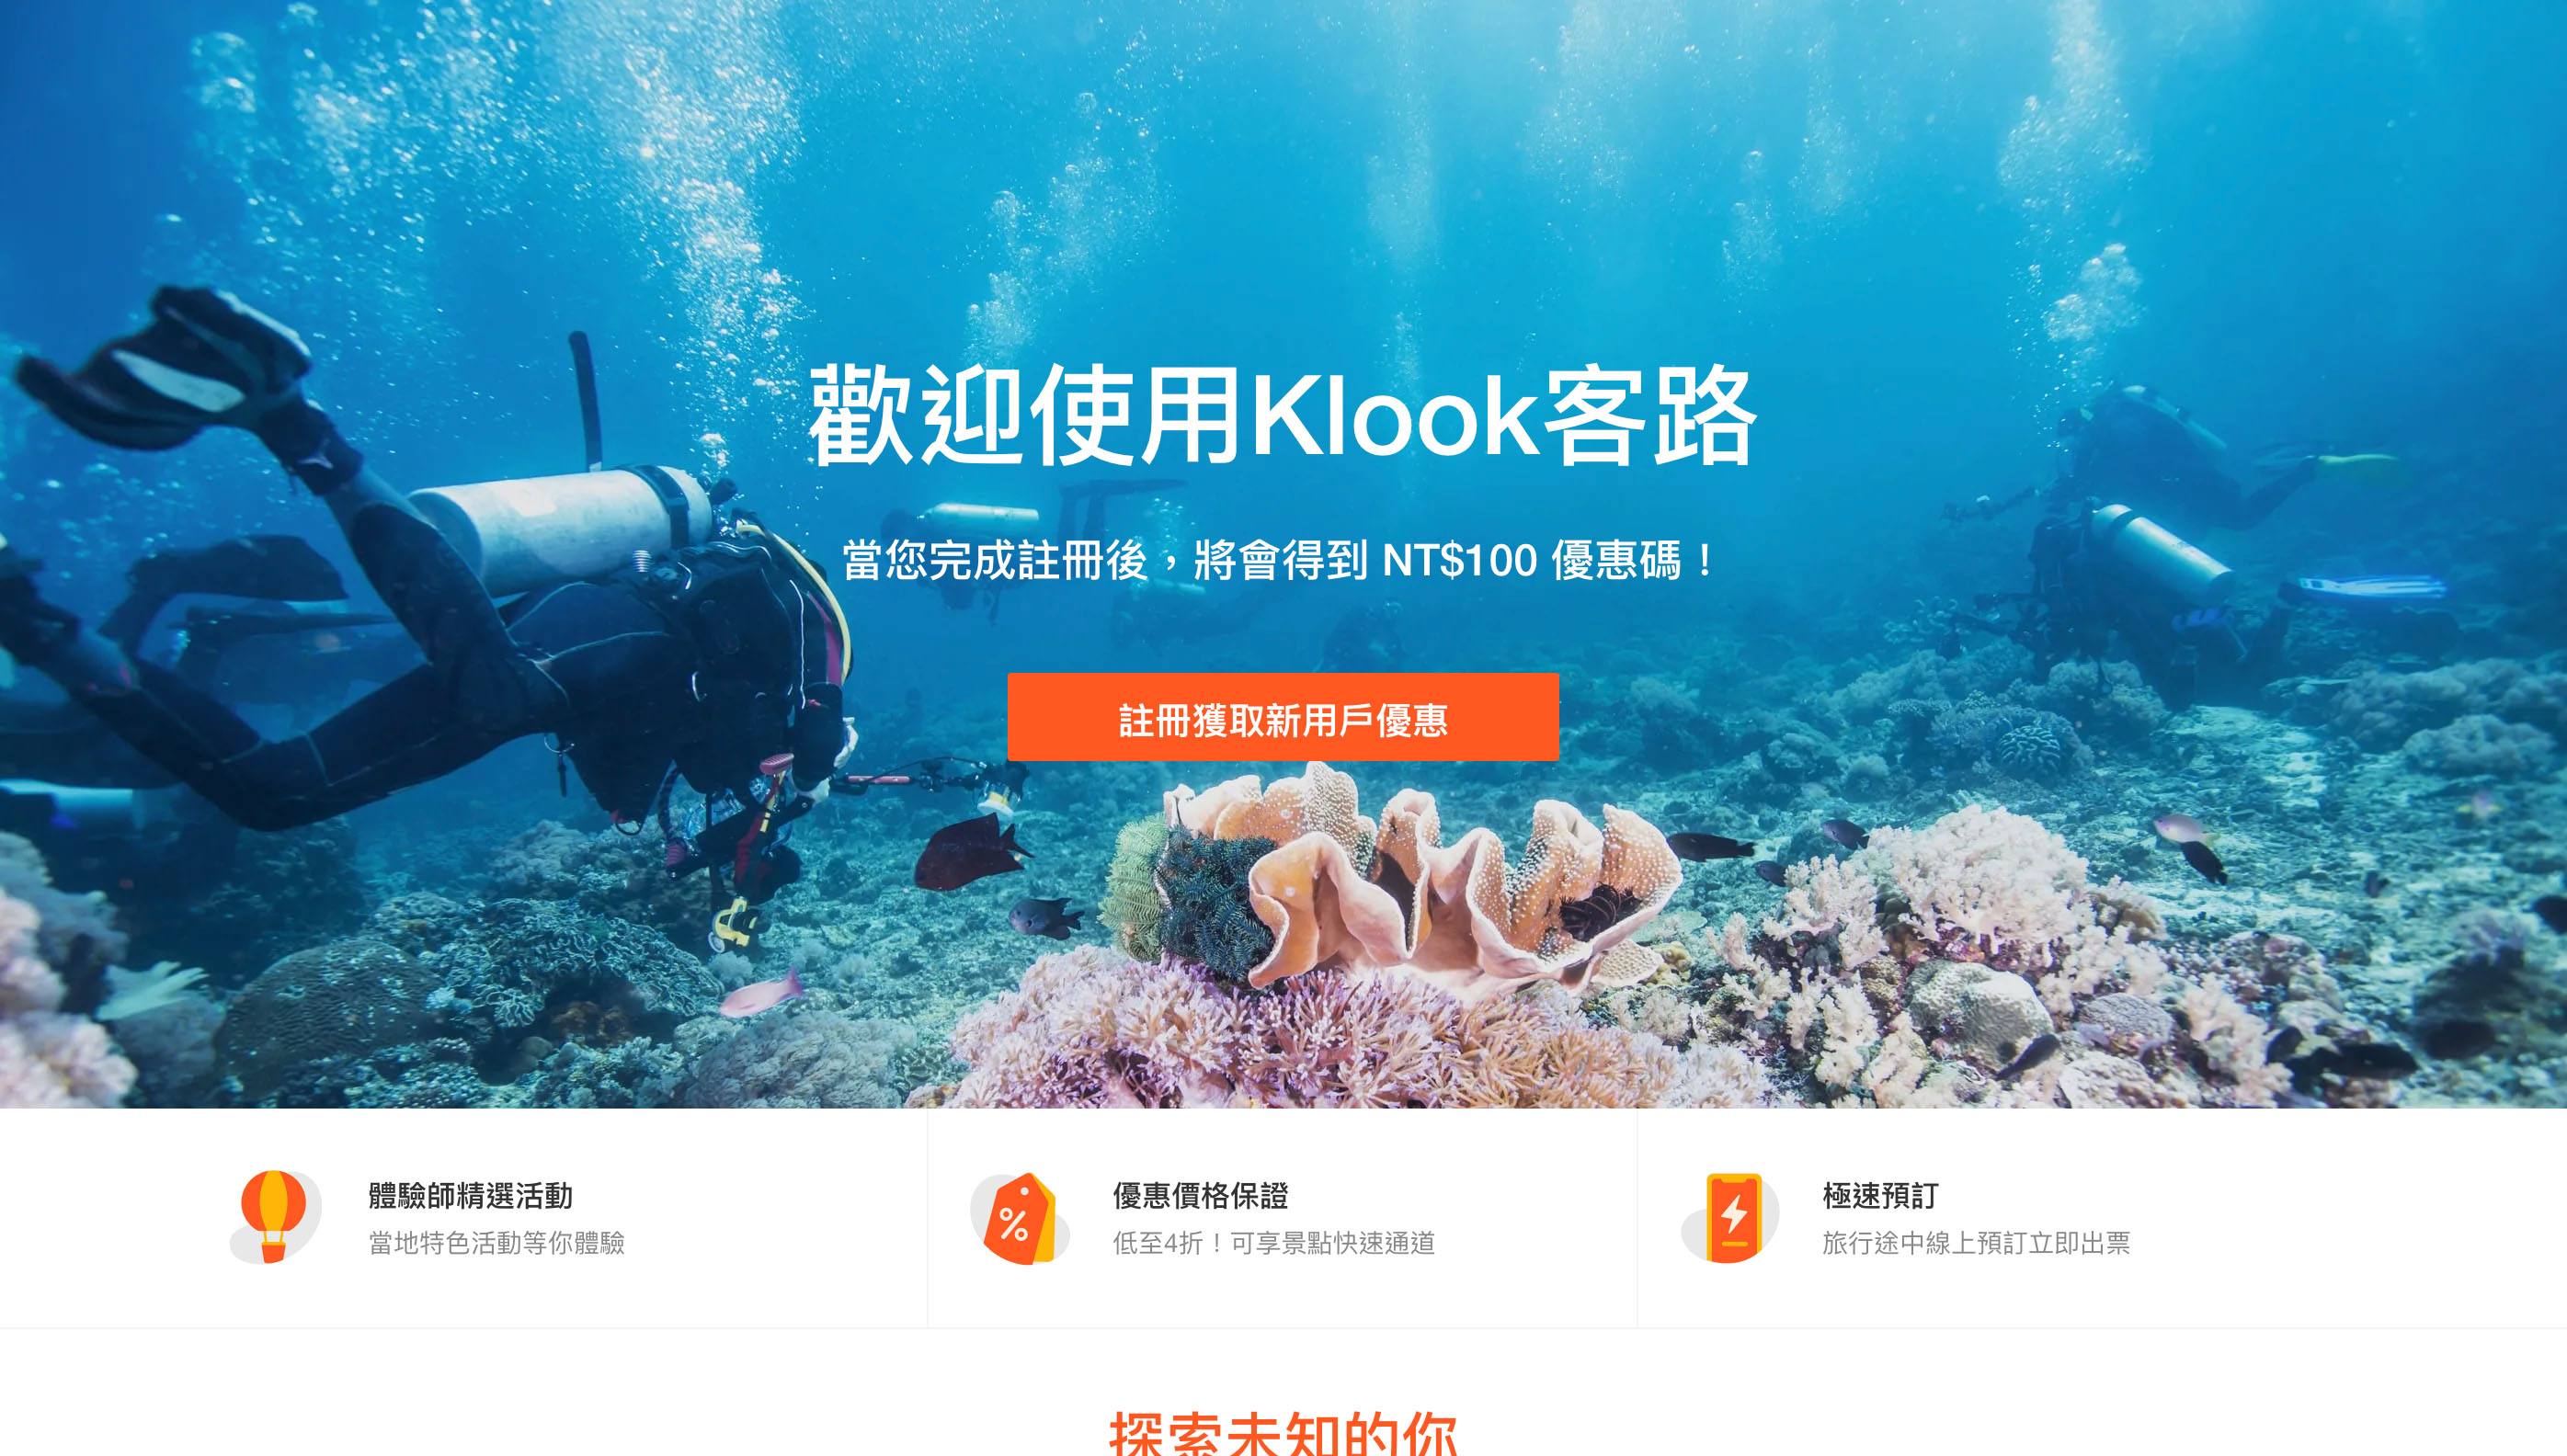 Klook客路旅遊體驗 首頁